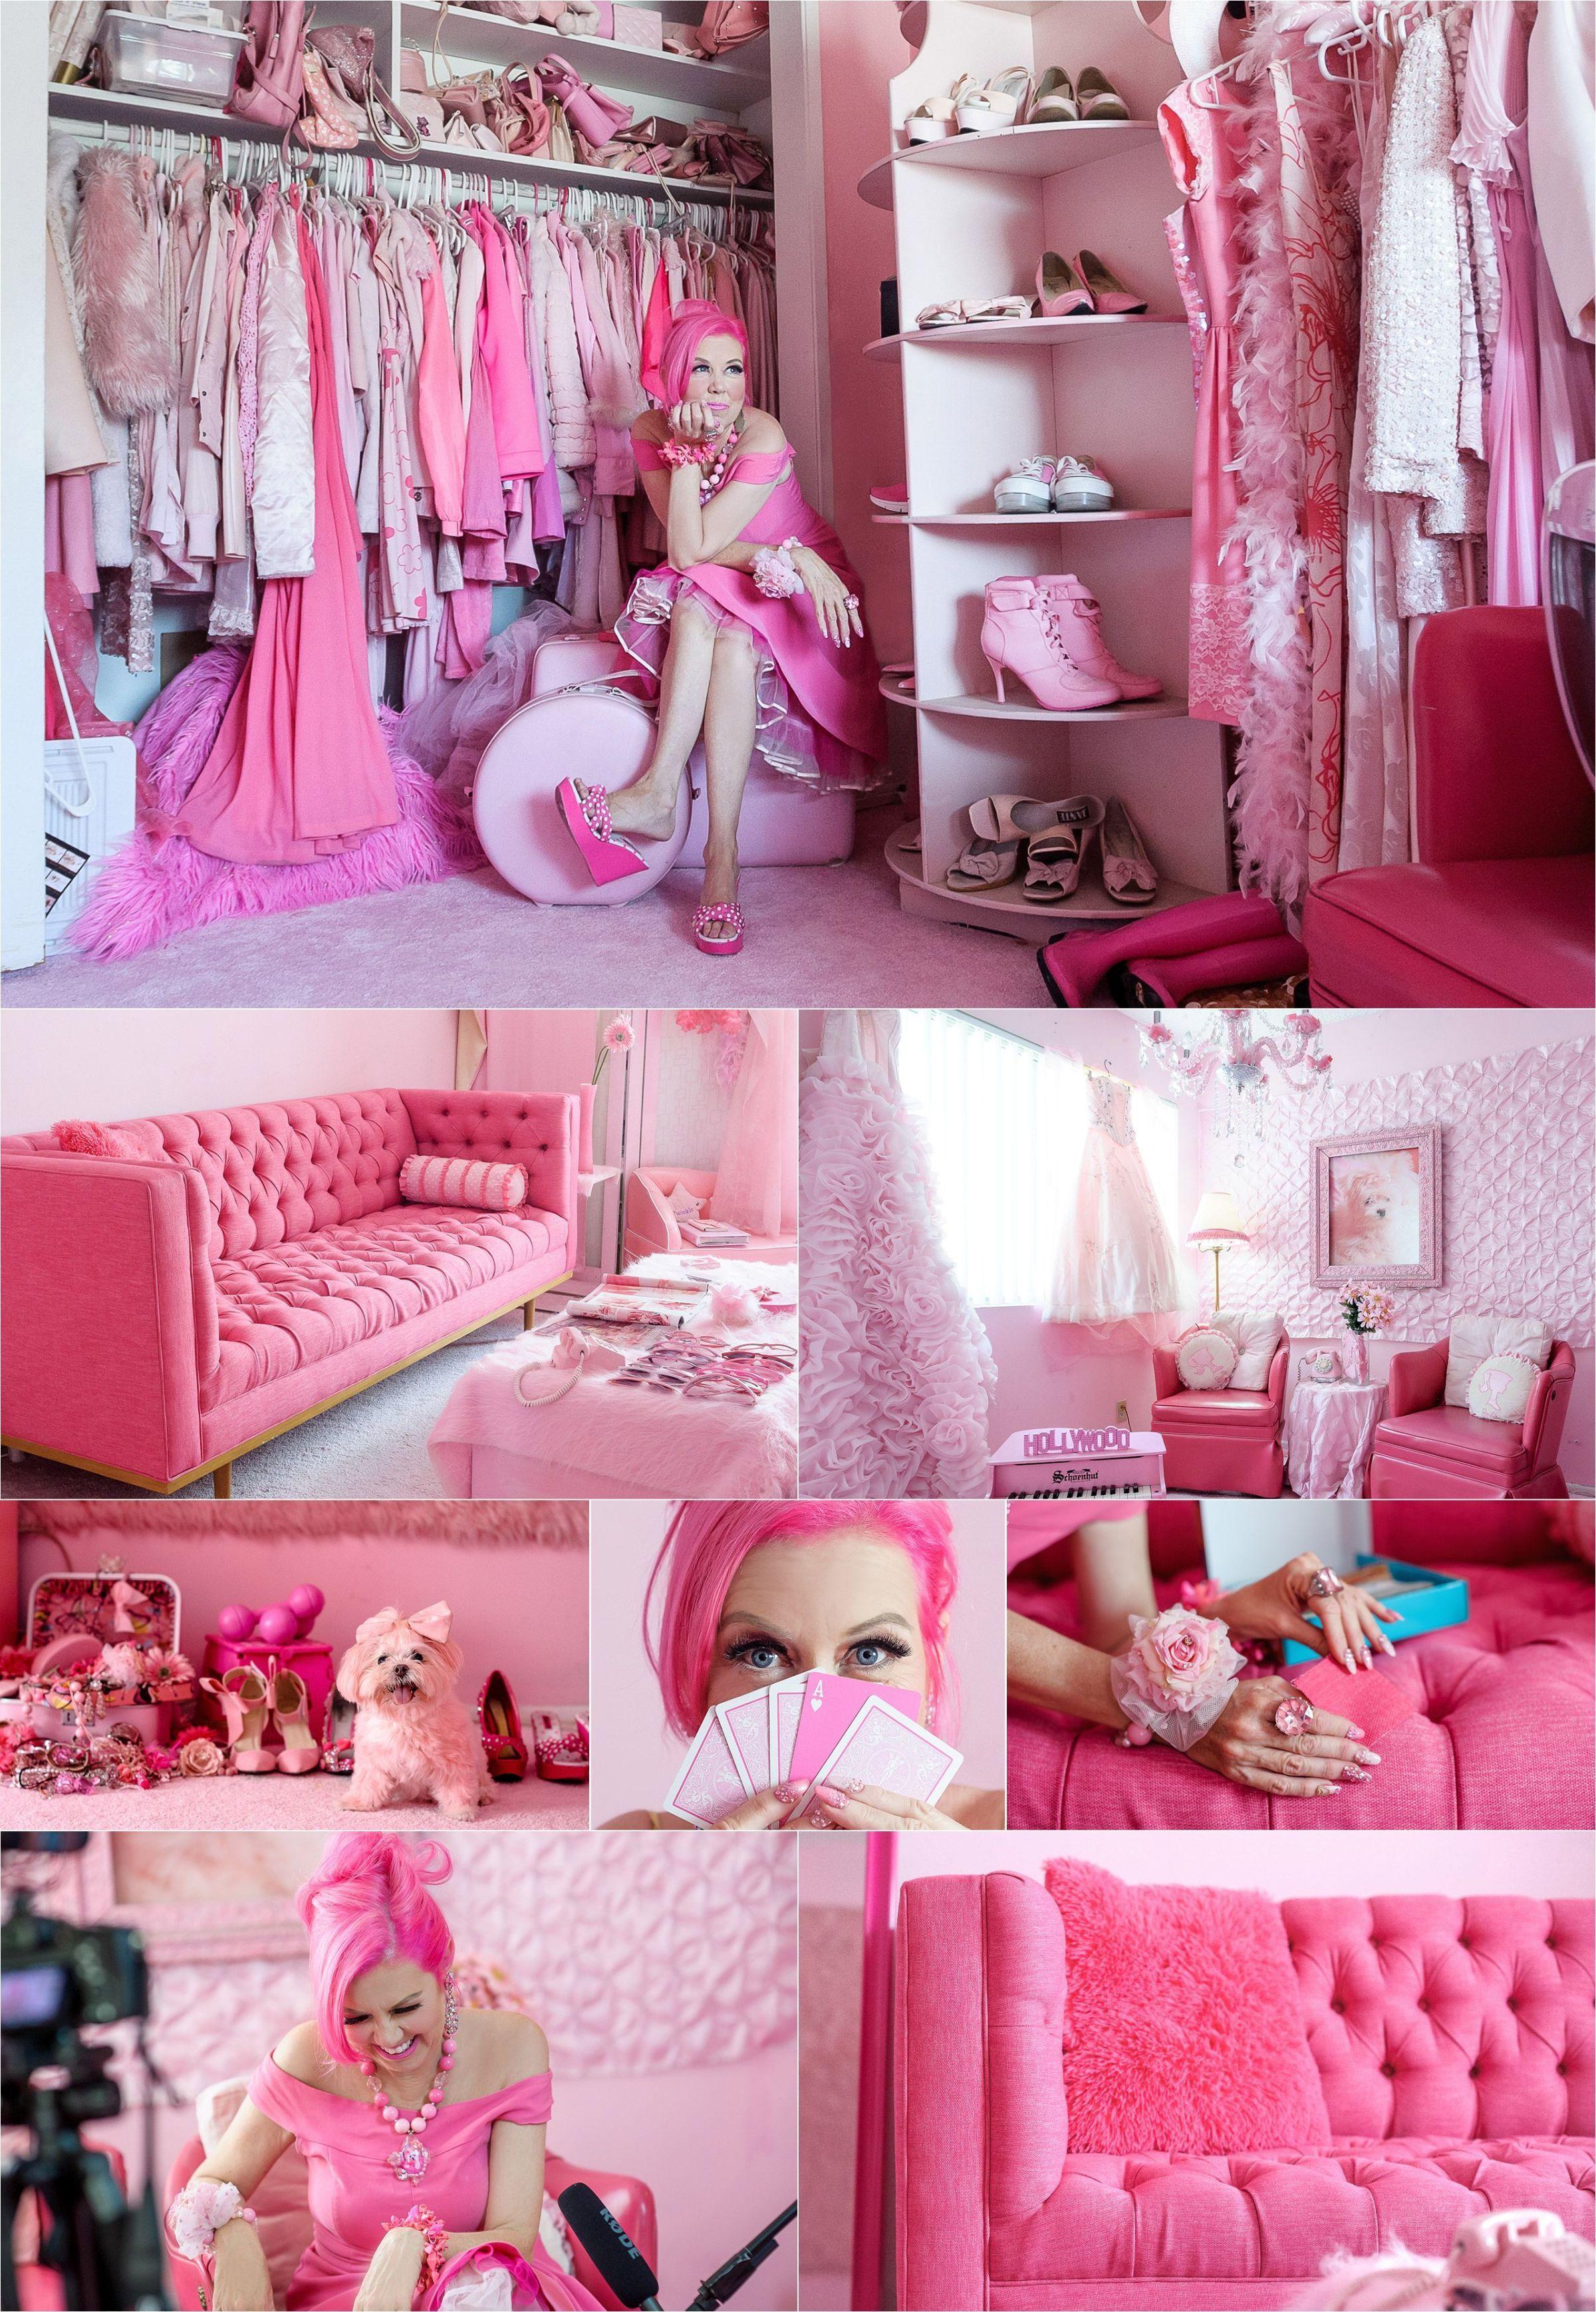 Canvas A Blog By Joybird Joybird Furniture Joybird Pink Interior